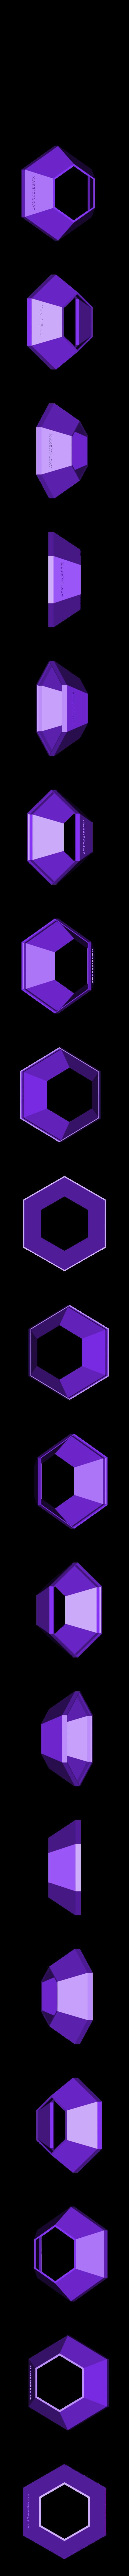 FloatP2_-_cover_angle_open.stl Download free STL file MakeItFloat Concept • 3D printer model, Rusichar